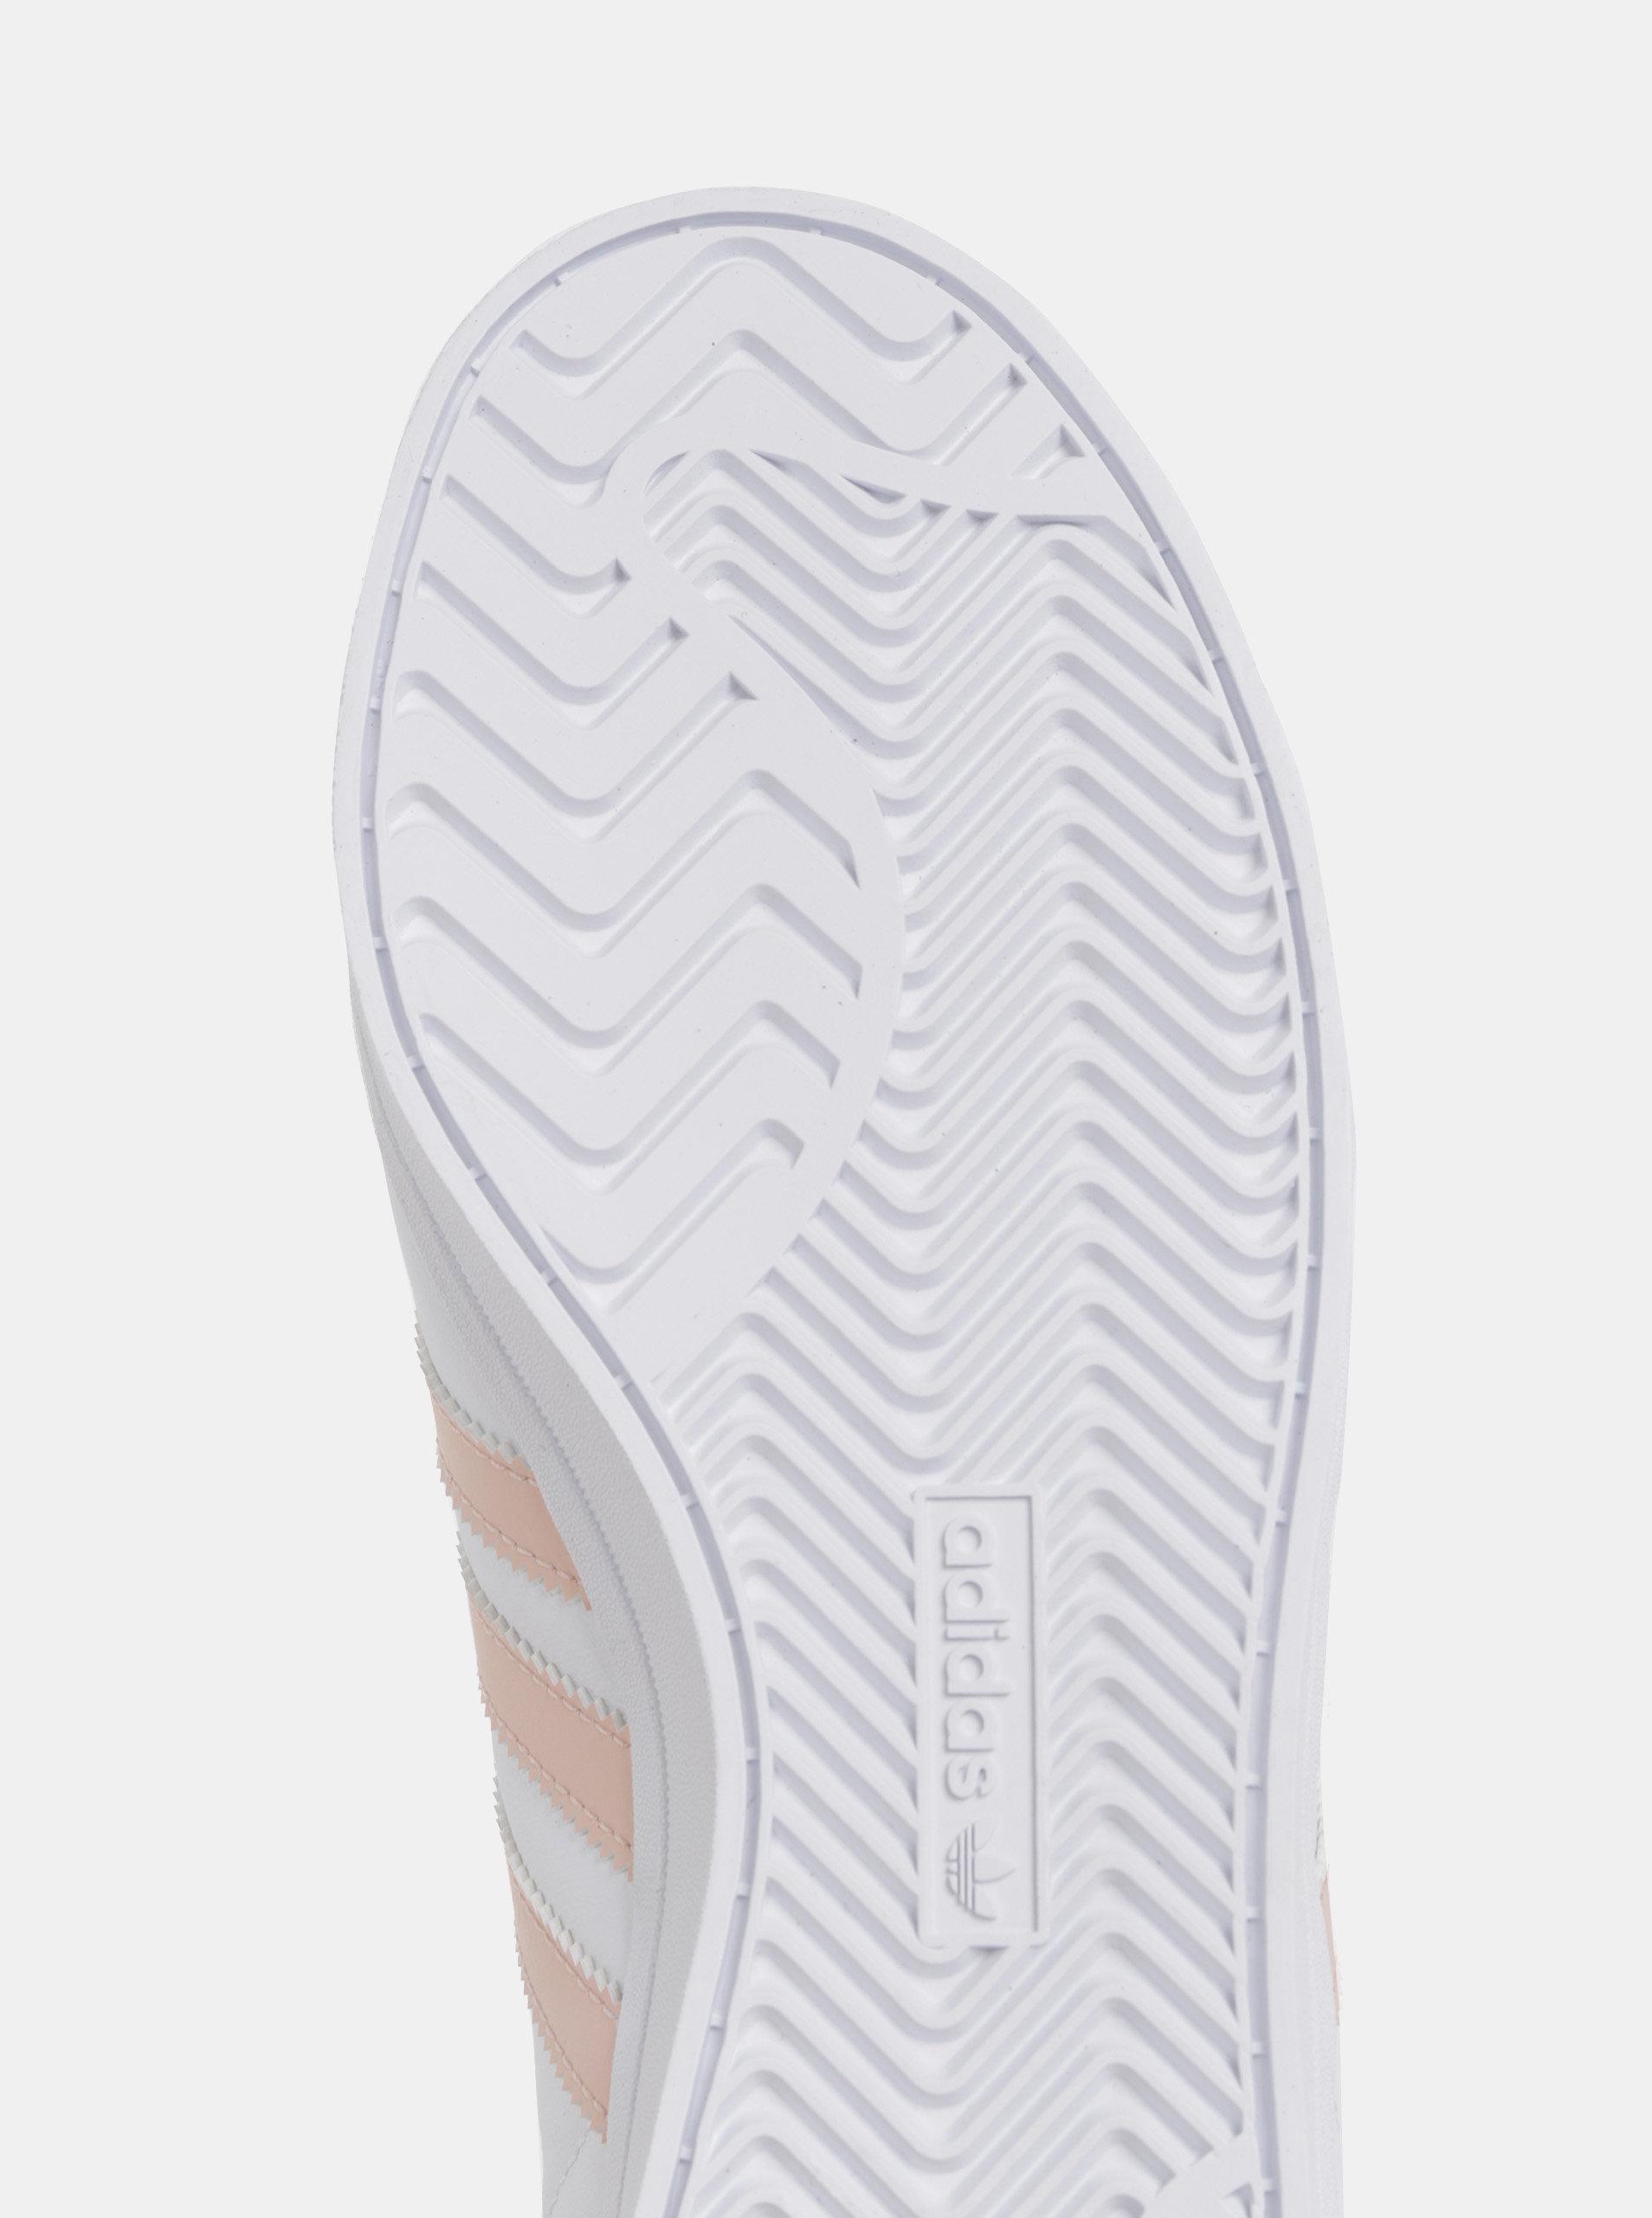 bd1e60ac64d43 Biele dámske kožené tenisky adidas Originals Coast Star | ZOOT.sk